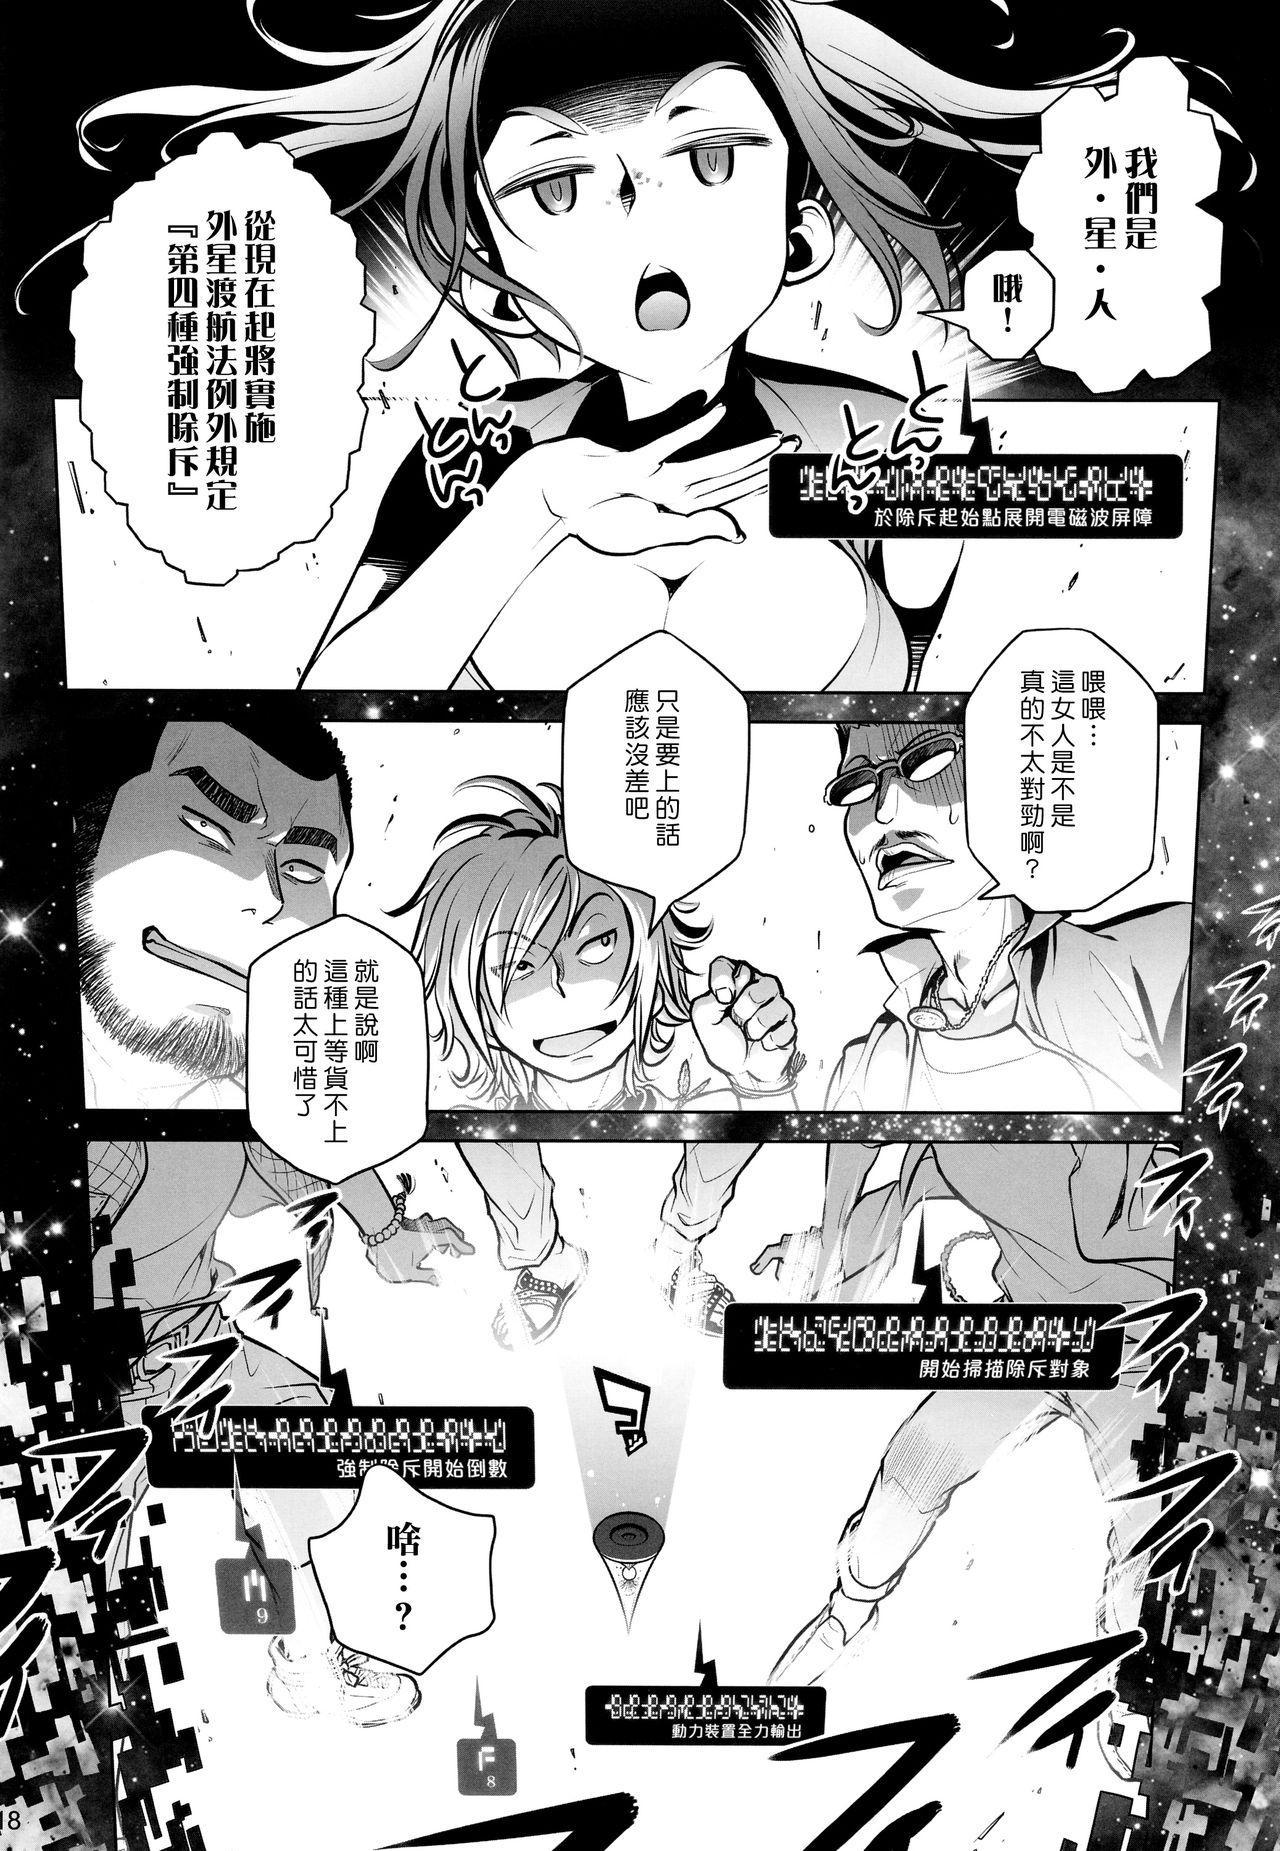 Sorako no Tabi 6 17